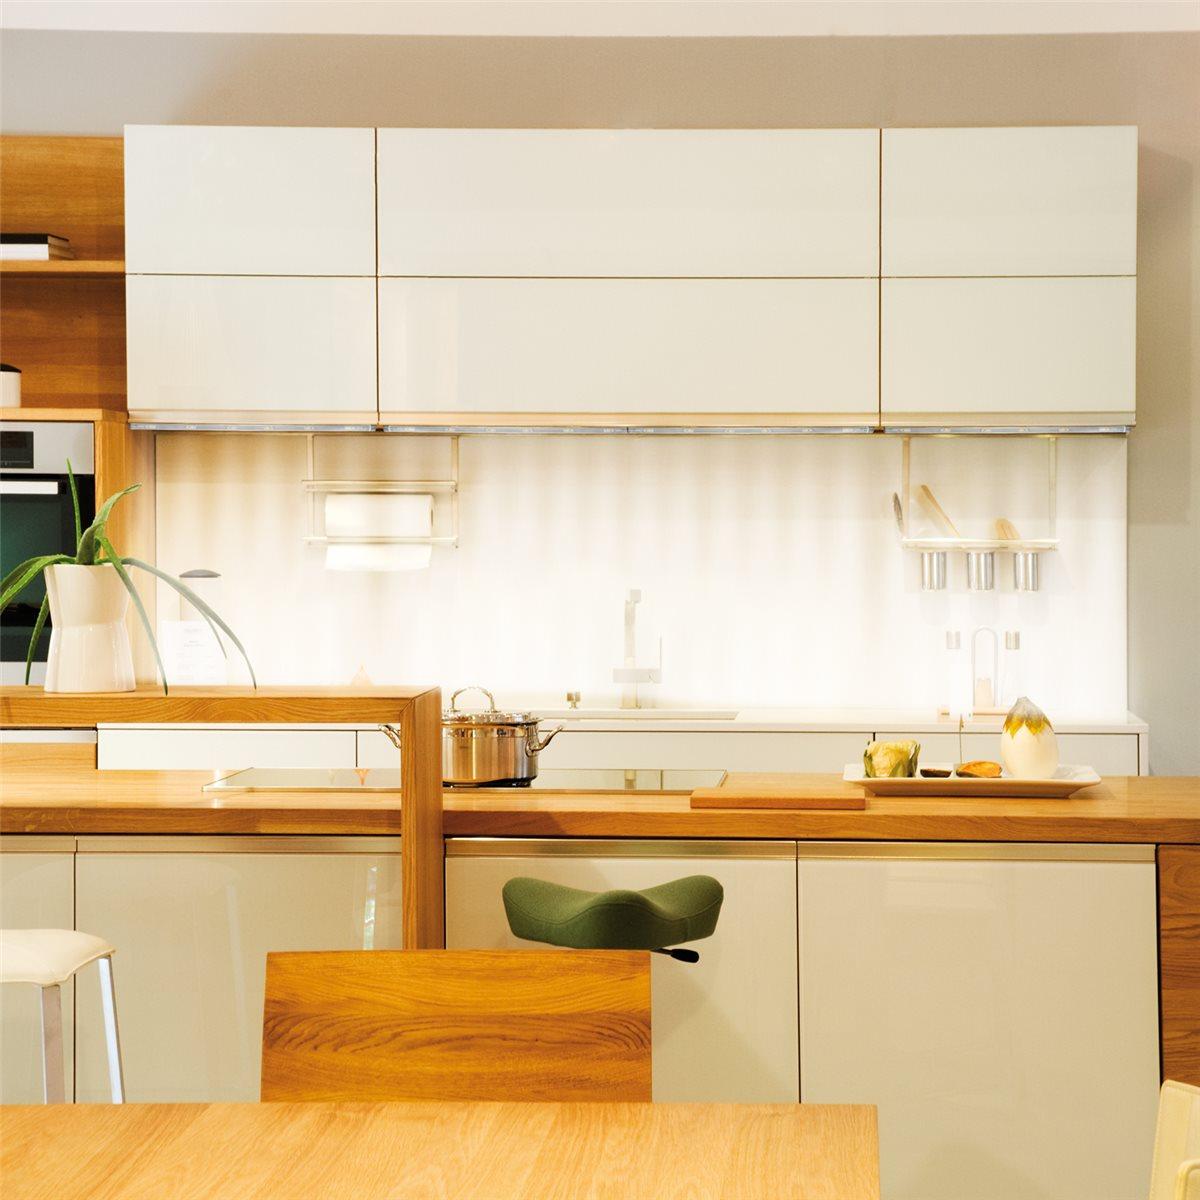 Lampenlux LED Unterbauleuchte Akani Unterbaulampe Küchenleuchte Küchenlampe Aufbauleuchte Aufbaulampe sehr flach Aluminium 230V 30cm - 90cm